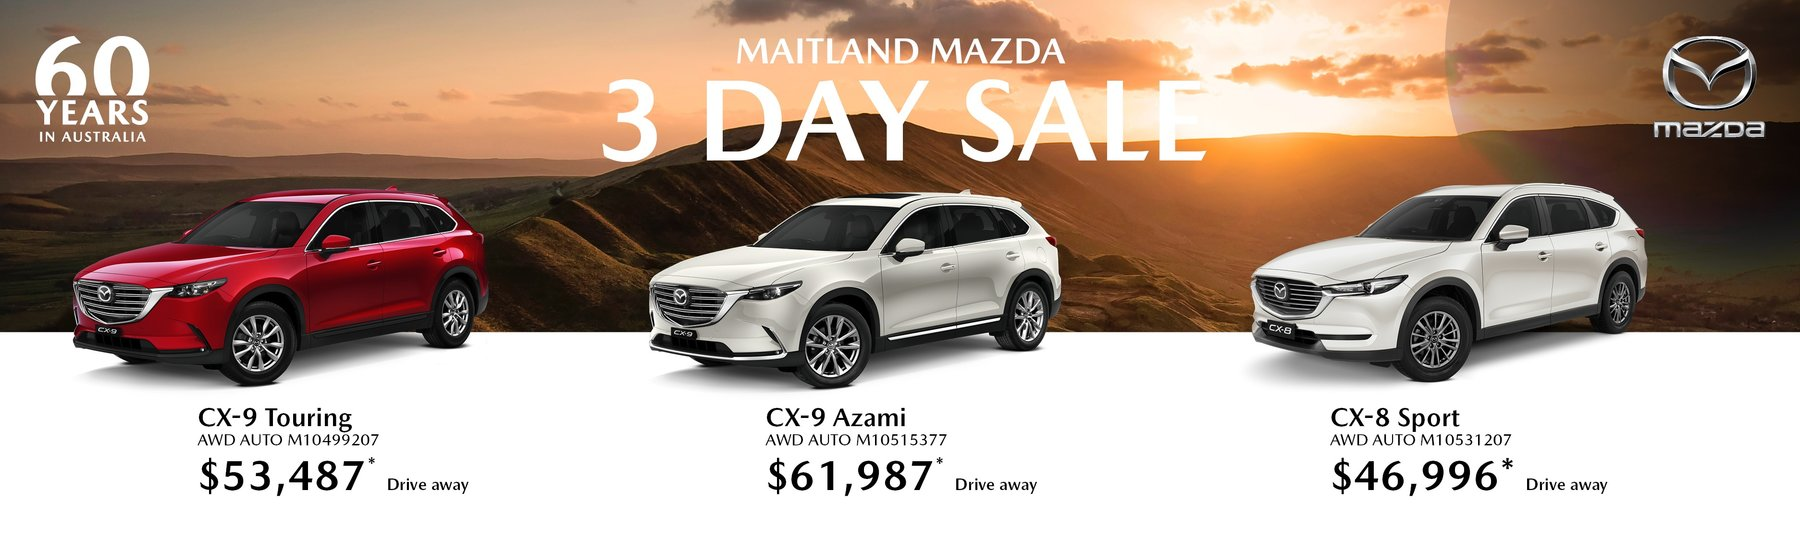 Maitland mazda 3 day sale